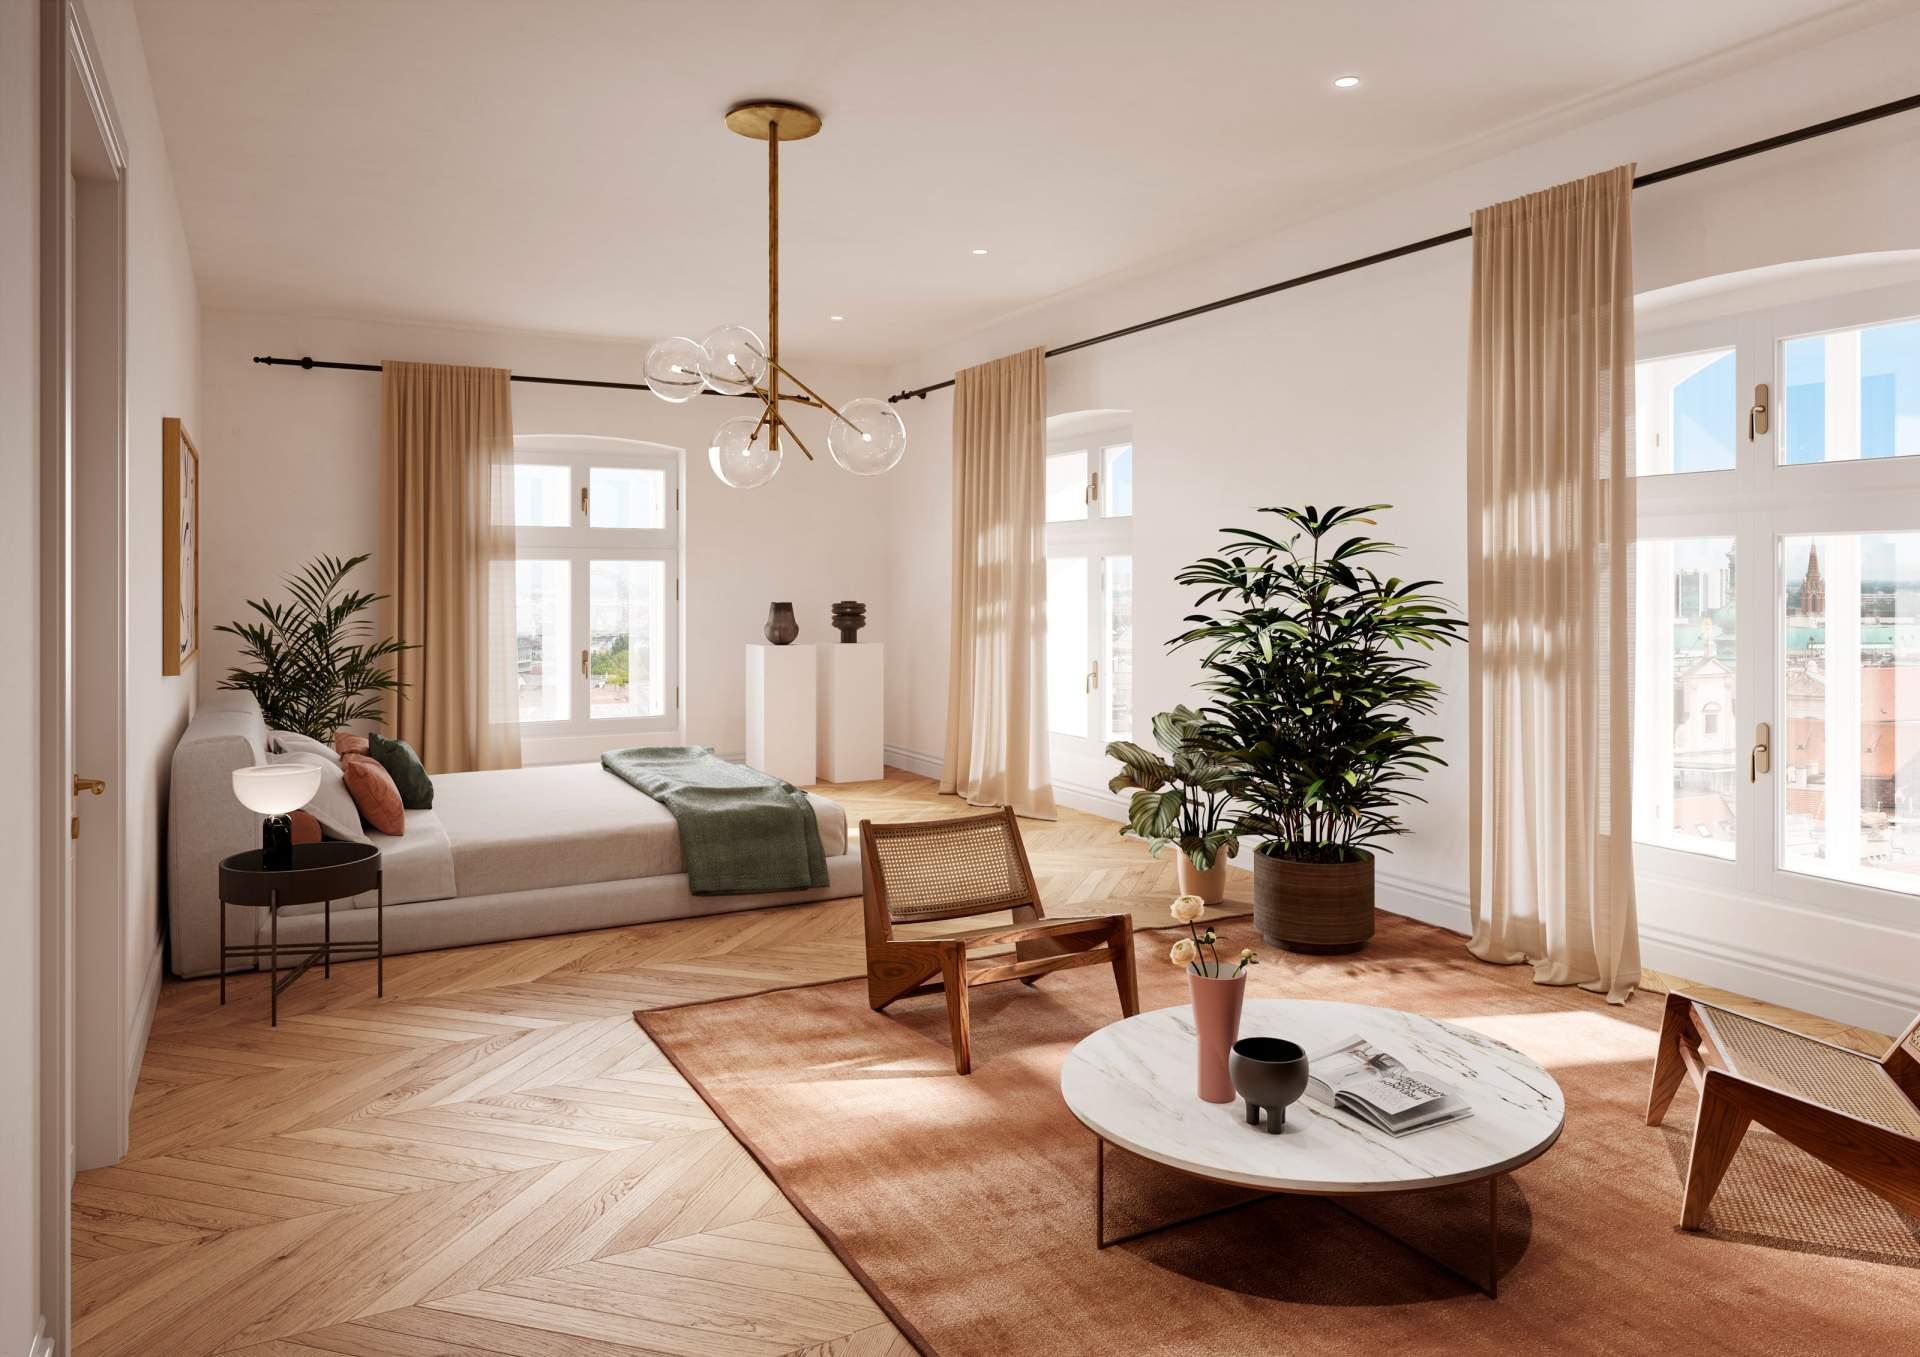 Apartment 602 - Master bedroom